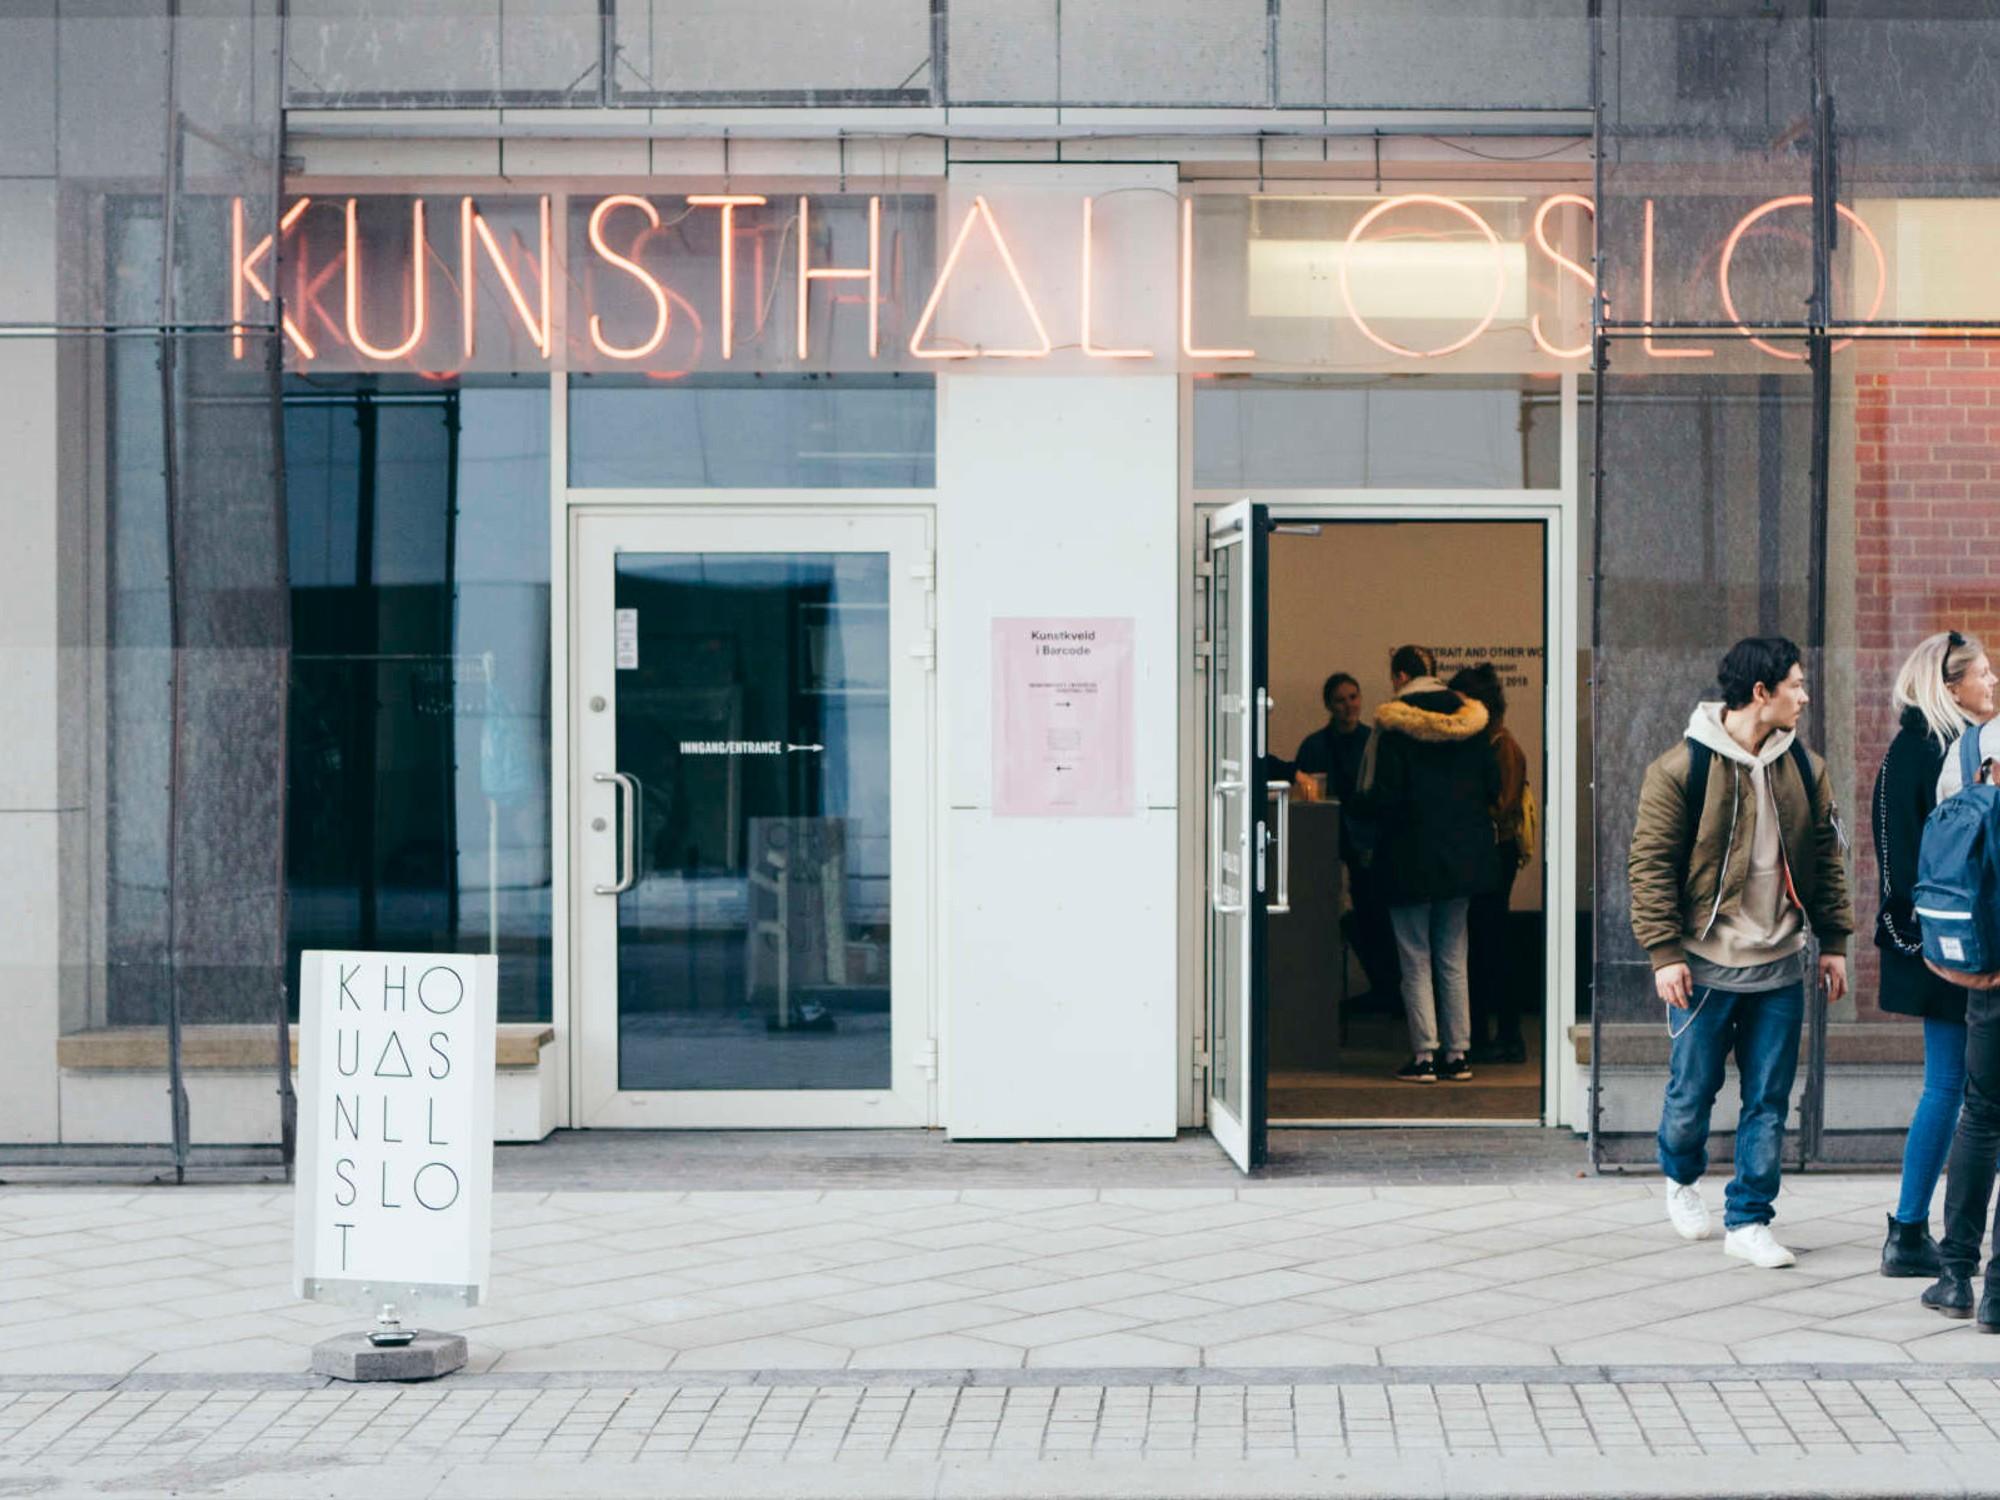 Kunsthall Oslo